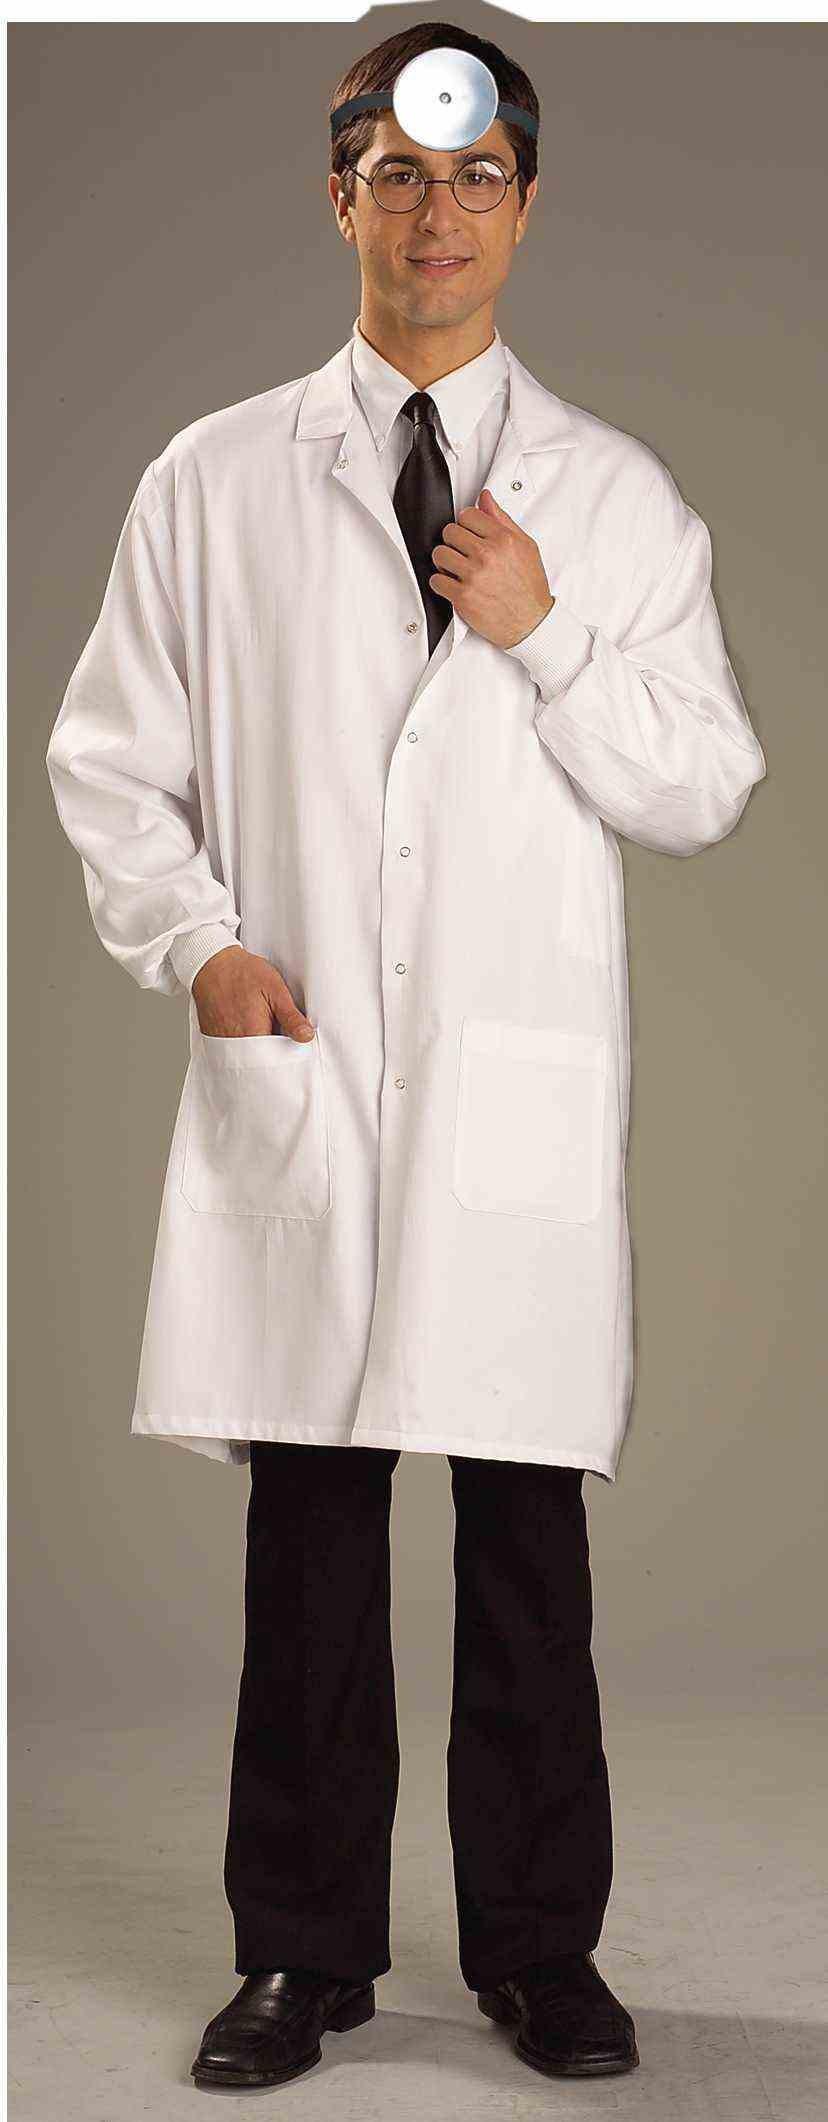 Medical, Lab Coat